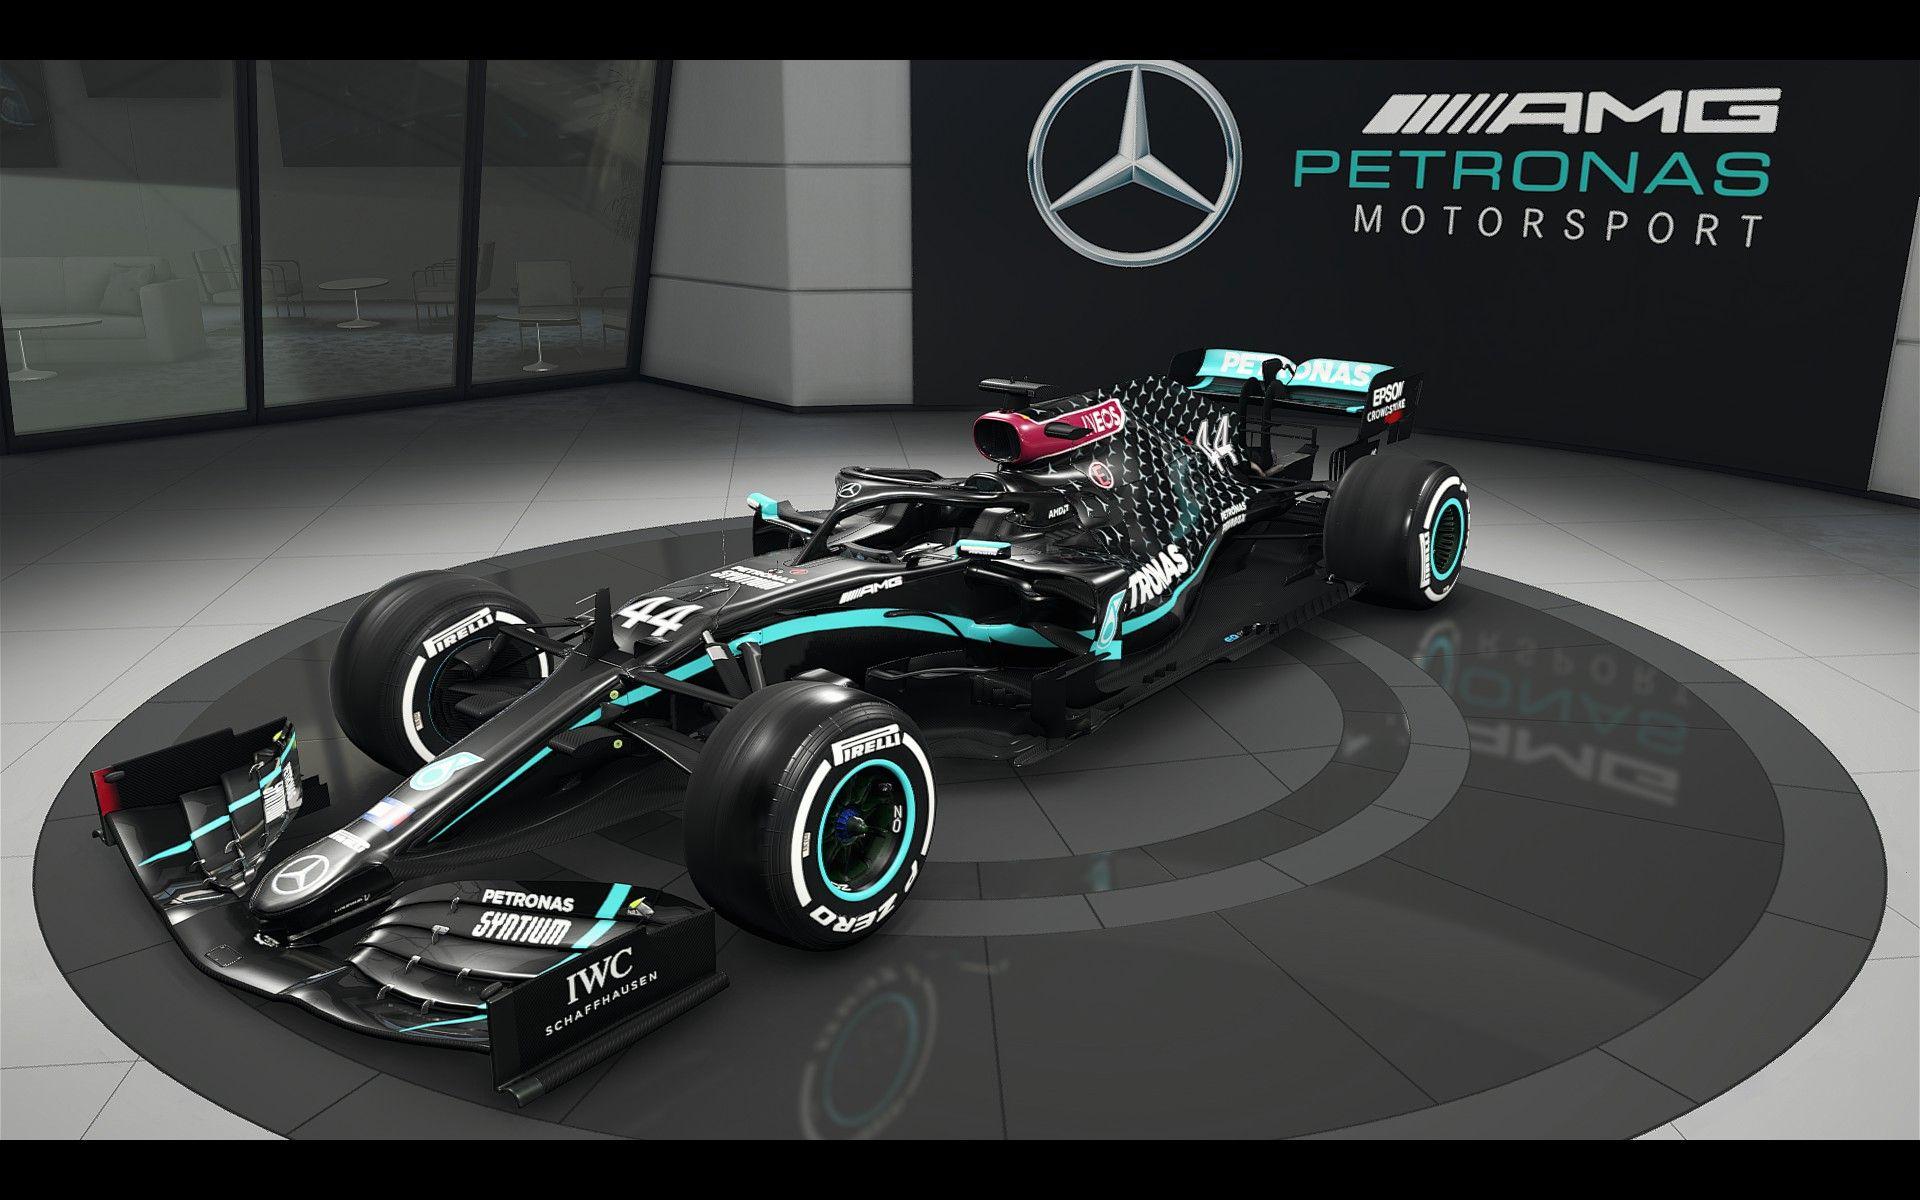 2019 Vs 2020 Mercedes F1 Livery 2020 [ 1200 x 1920 Pixel ]